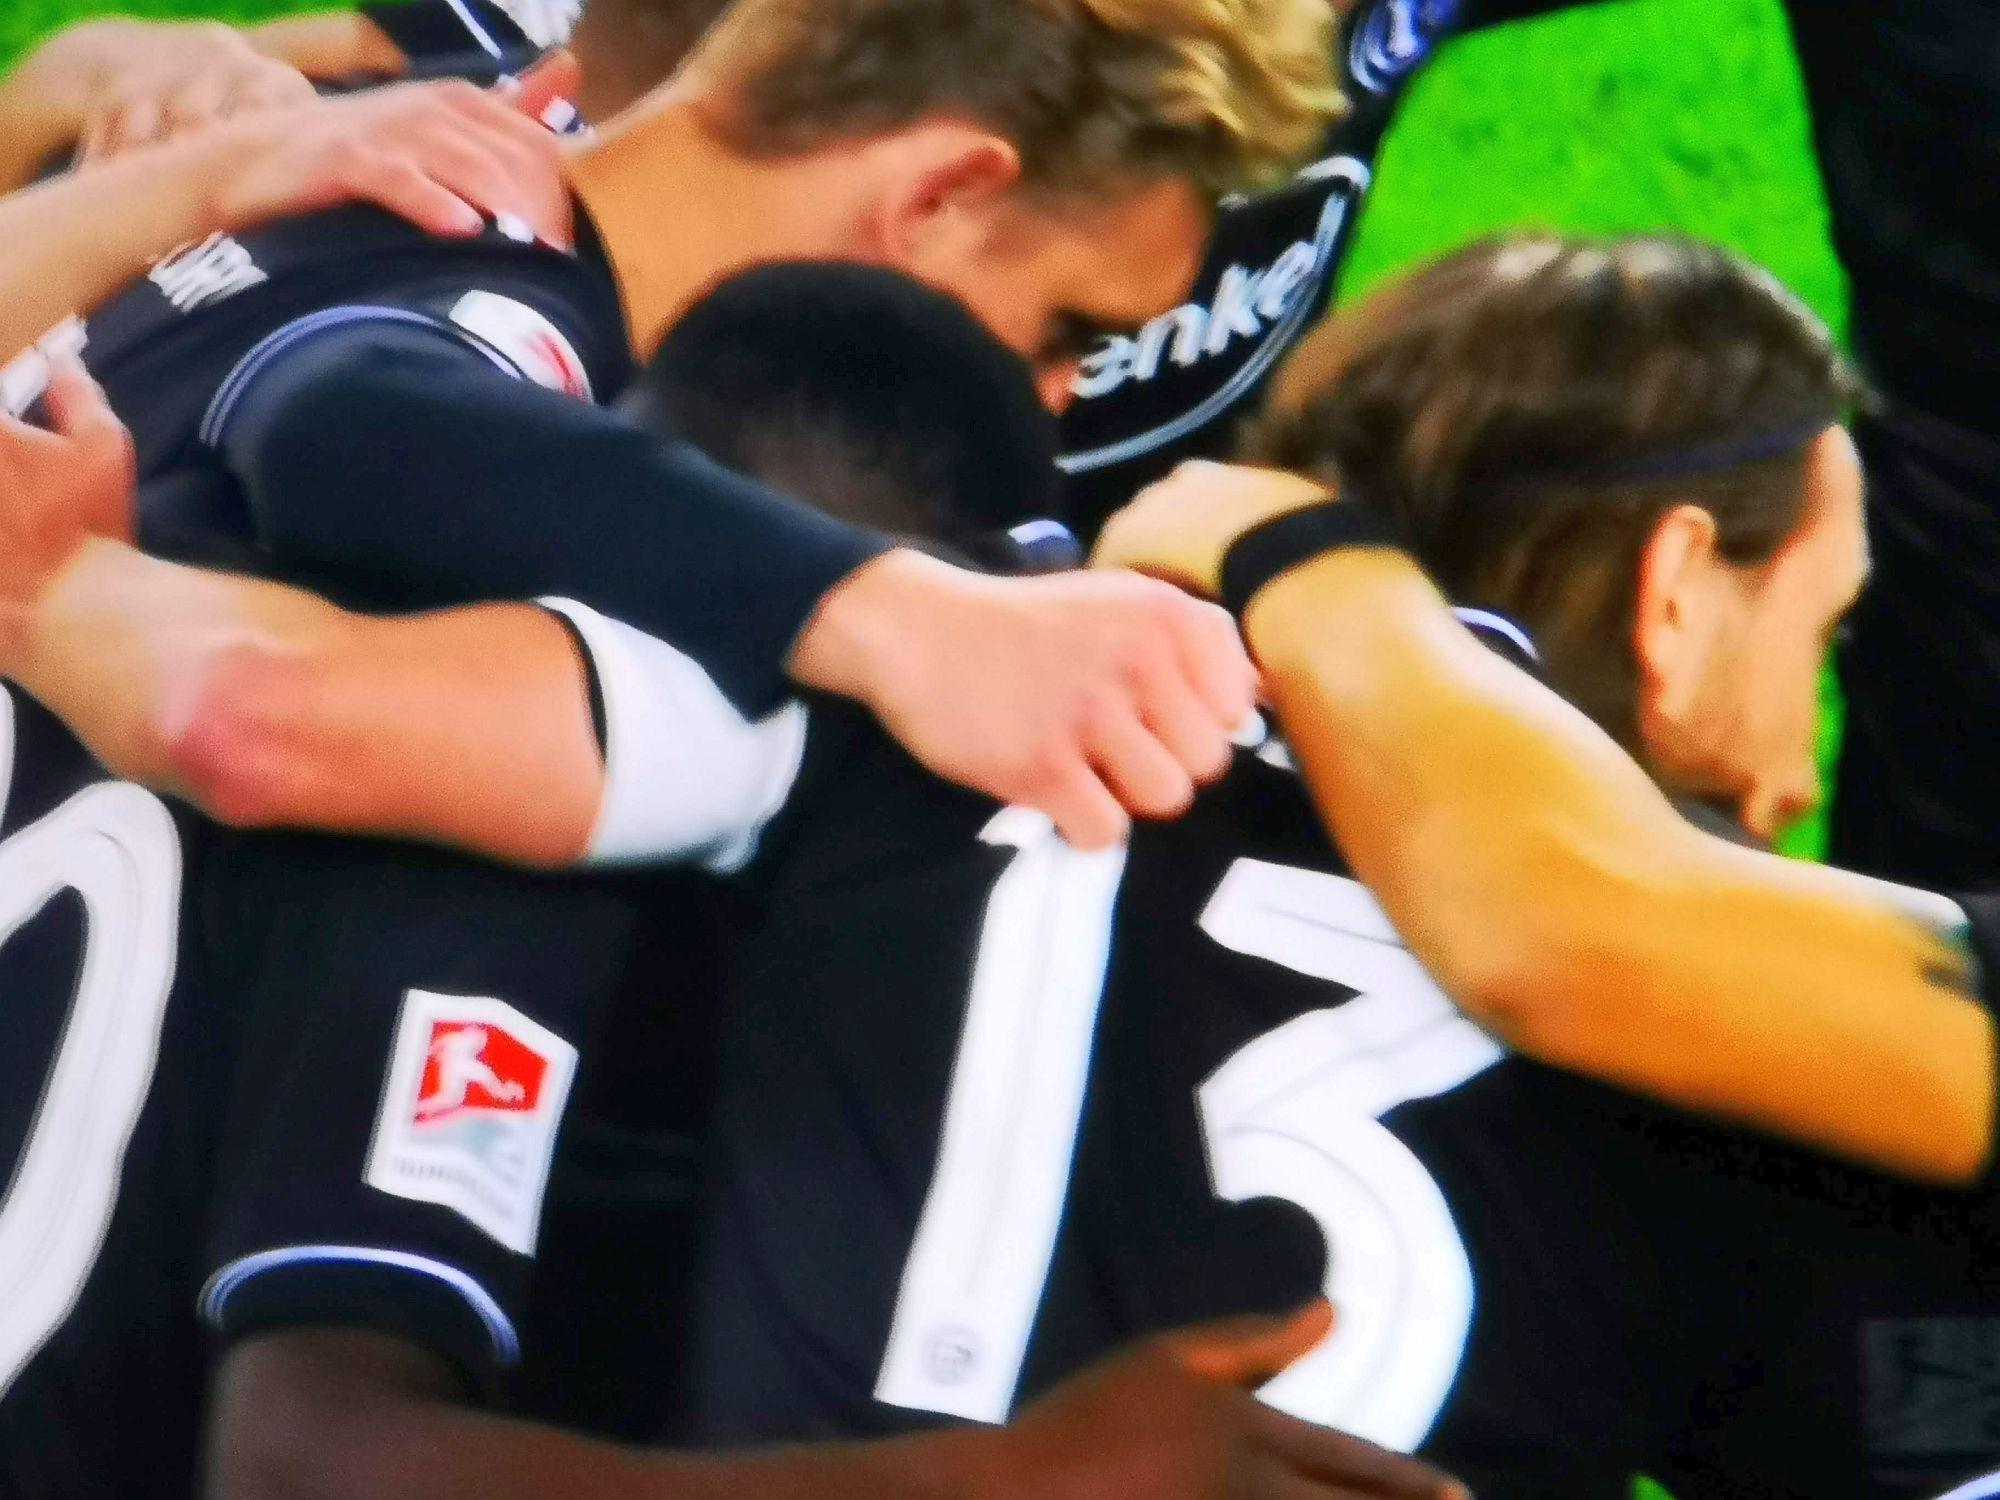 HSV vs F95: Ein verschworener Haufen in Schwarz (Screenshot Sky)